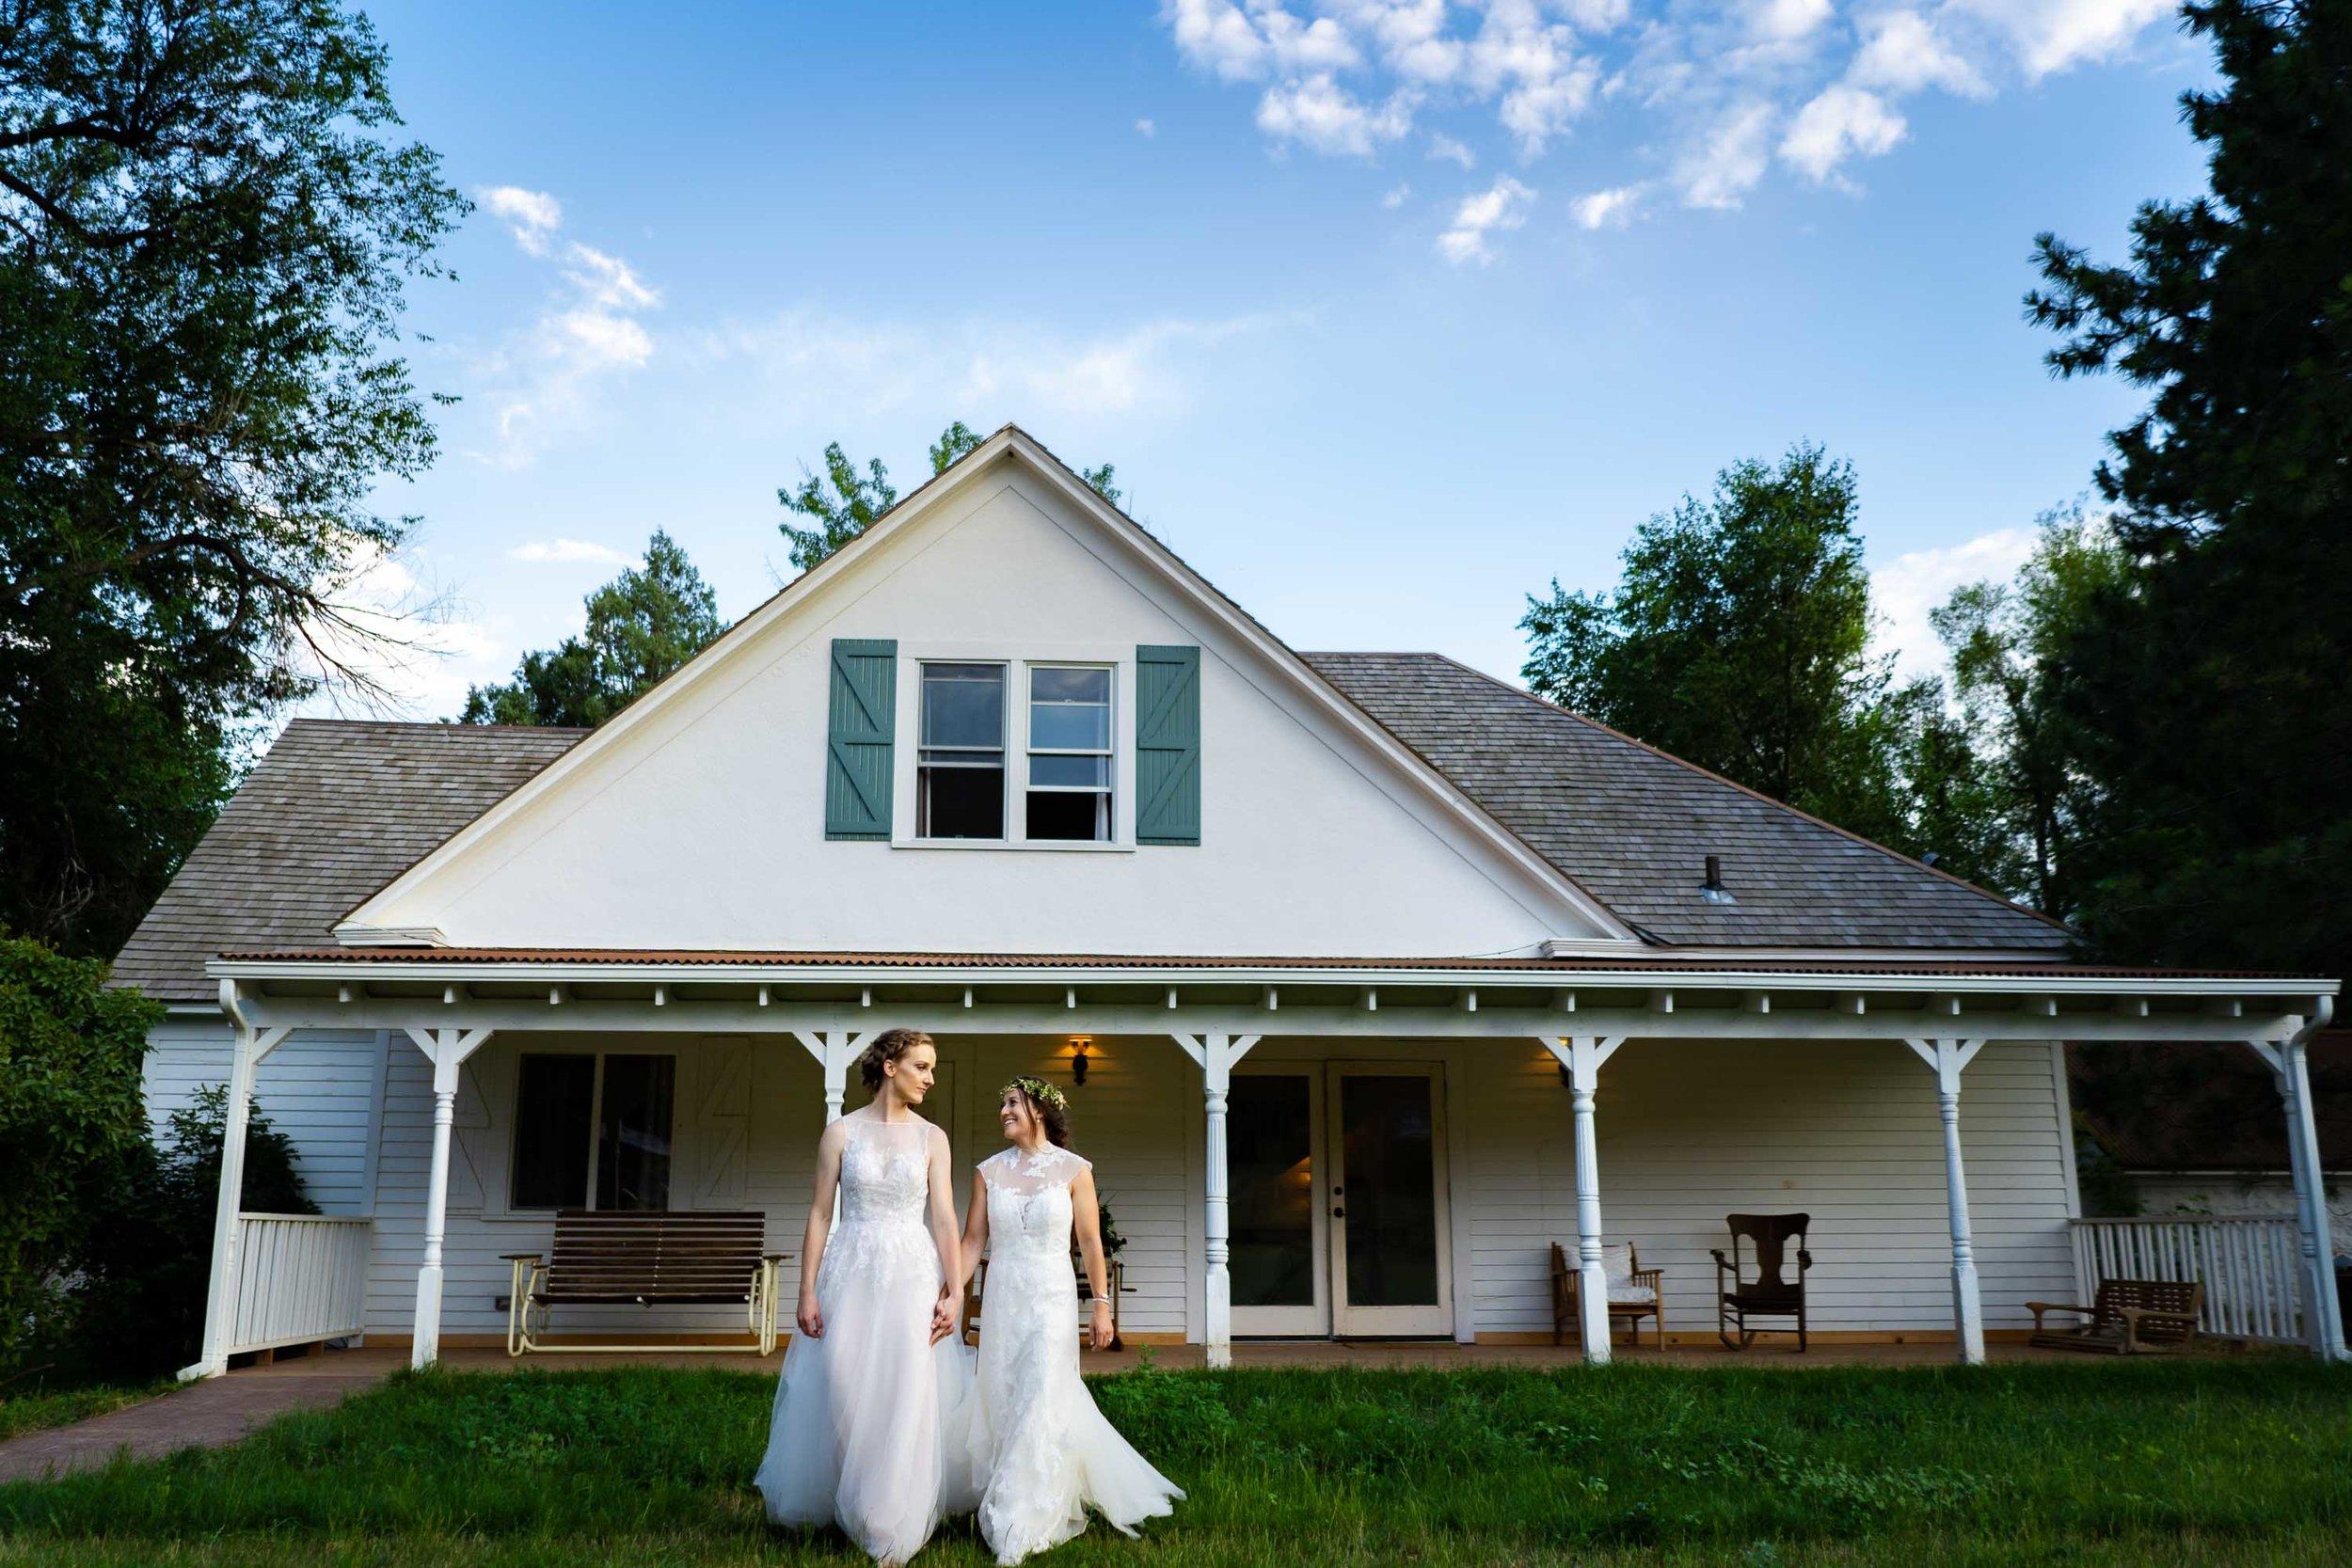 Rist_Canyon_Inn_Laporte_Wedding-143.jpg